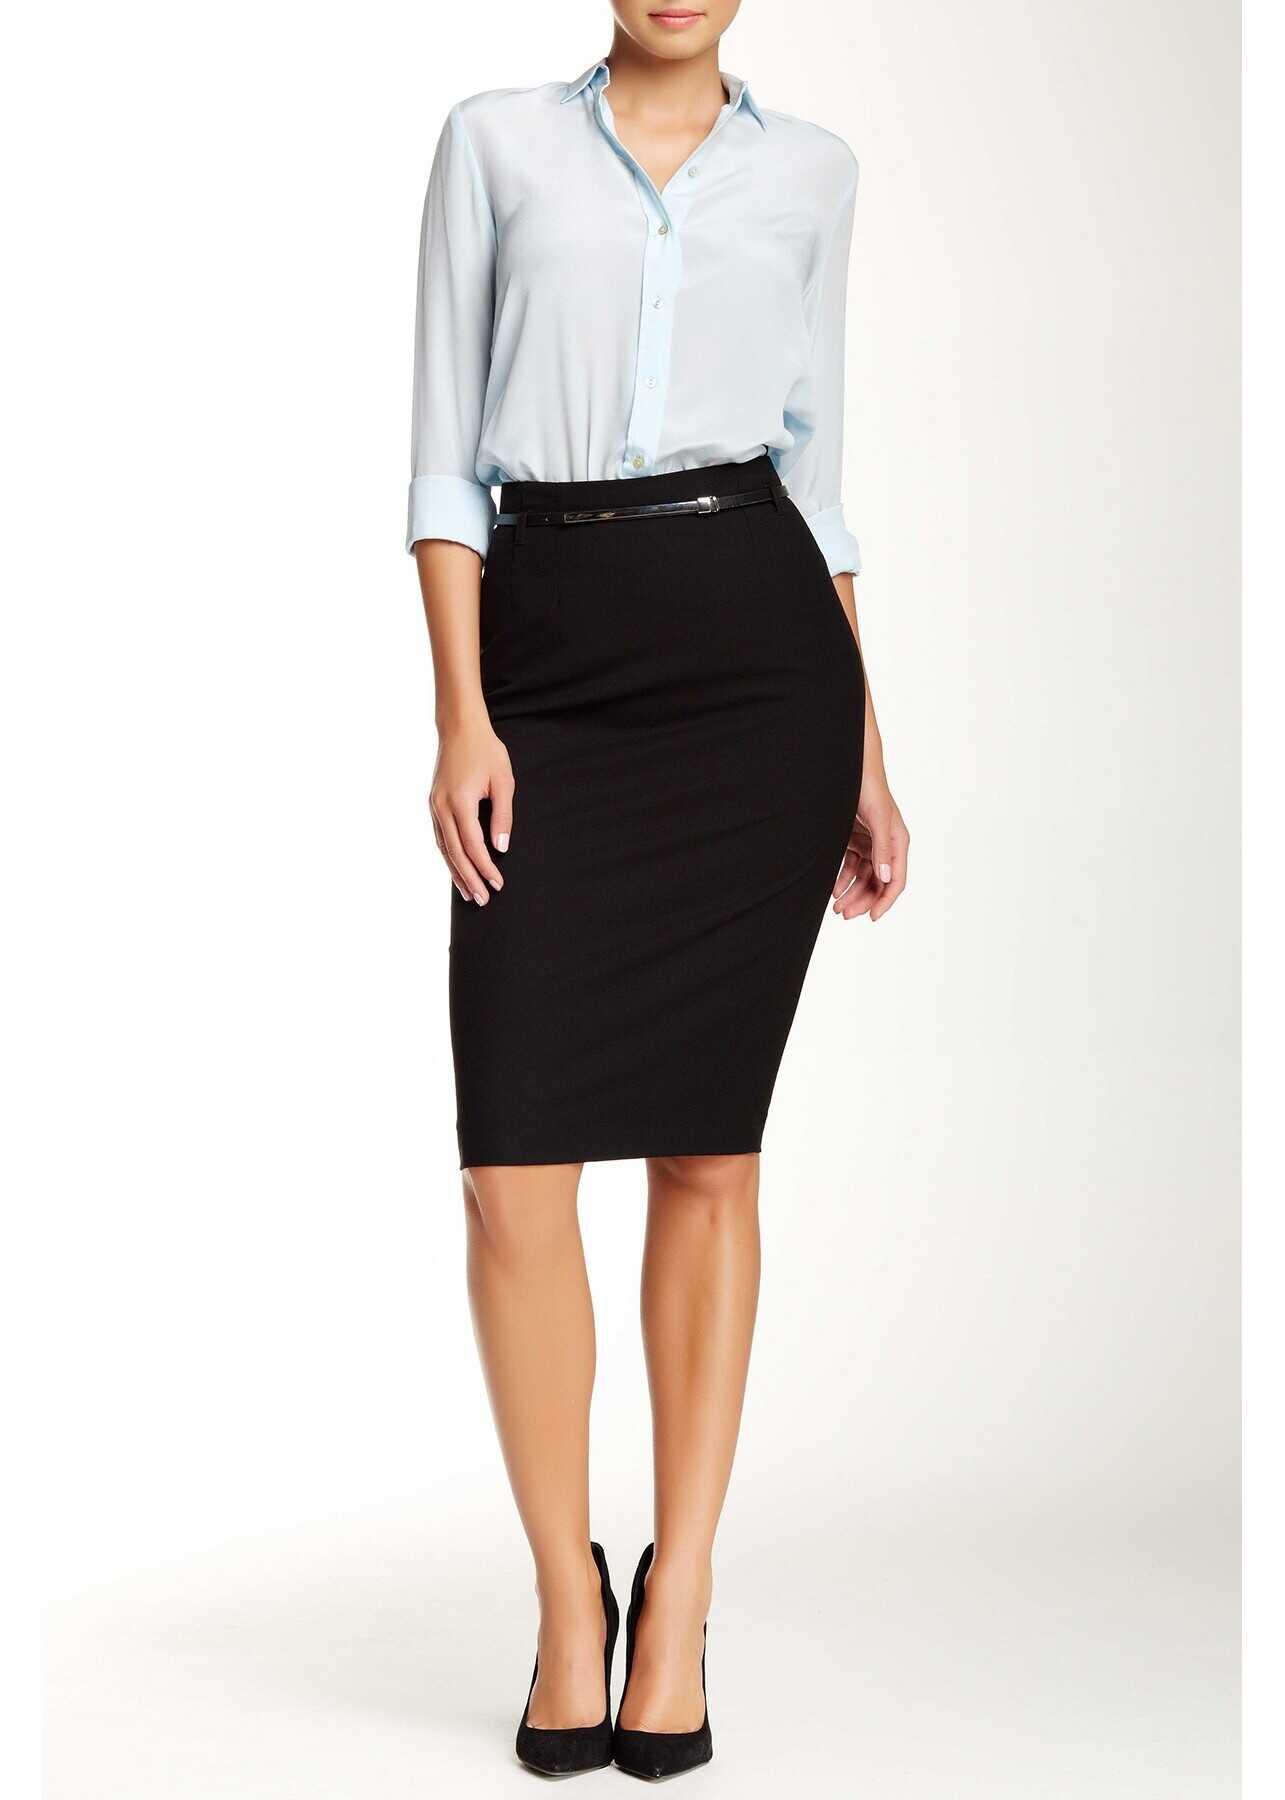 Amanda & Chelsea Signature Belted Pencil Skirt* BLACK